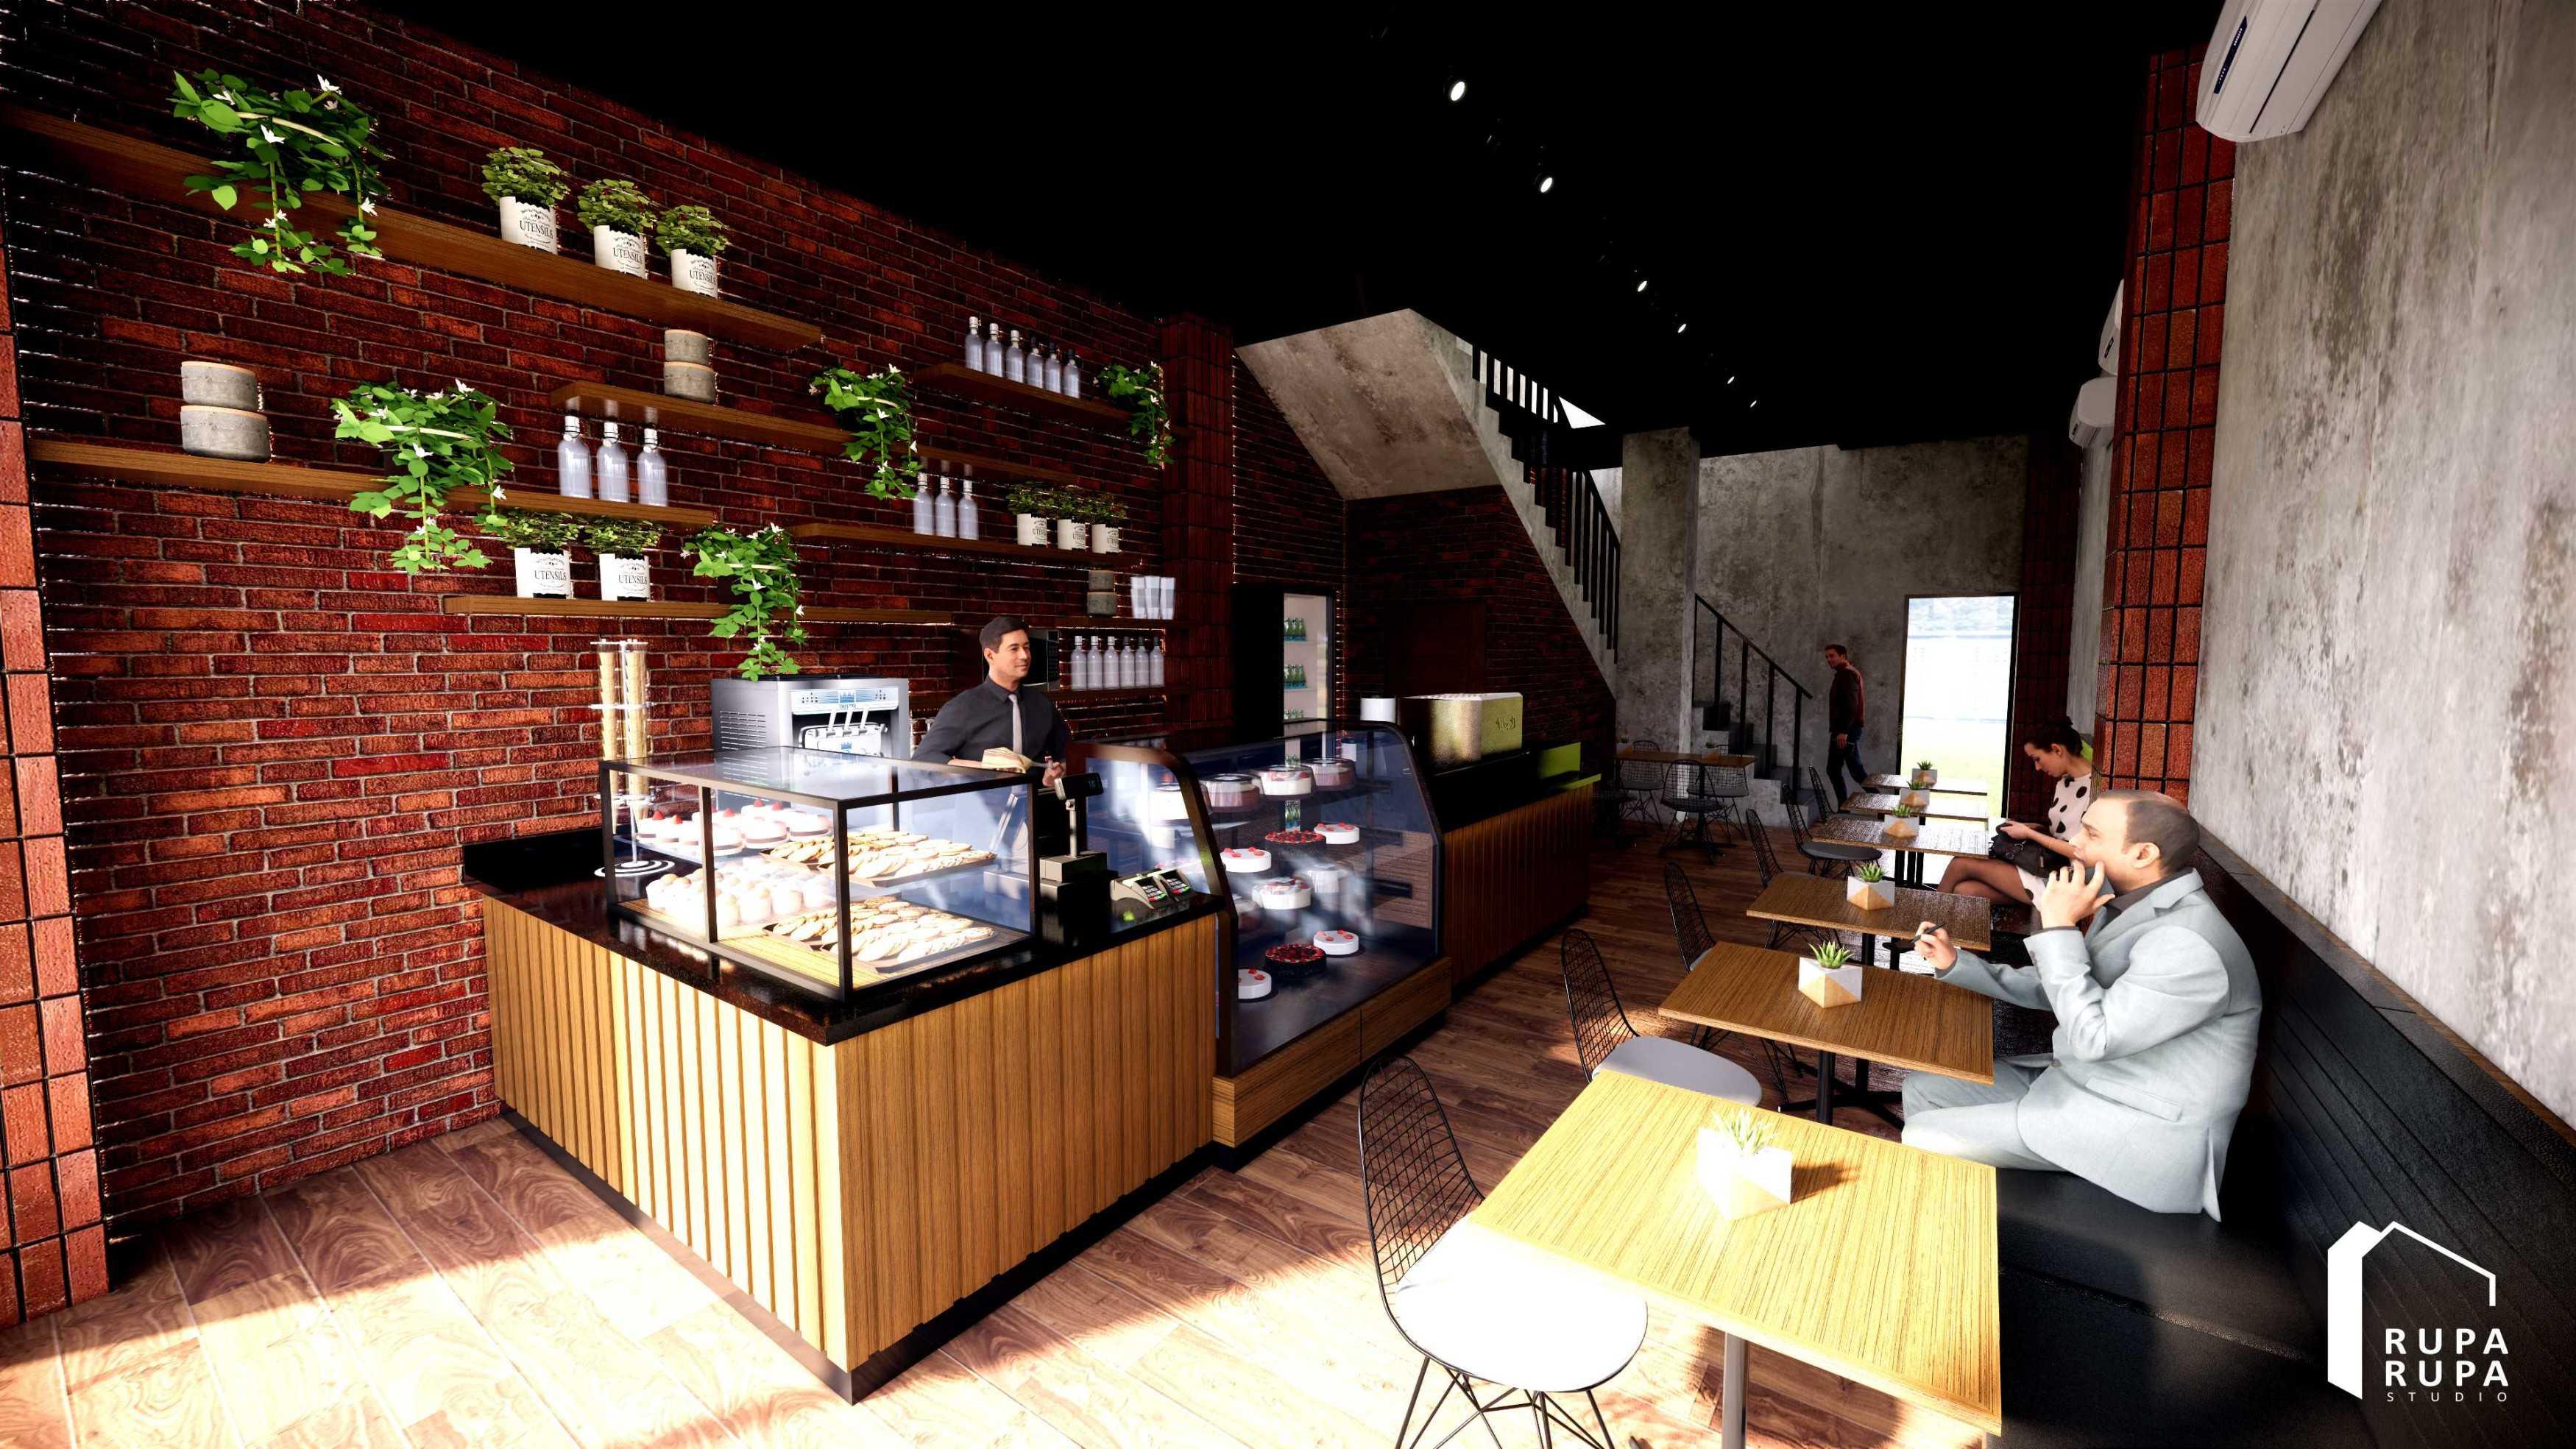 Studio Rupa Rupa Drupadi Corner Cafe Bali, Indonesia Bali, Indonesia Studio-Rupa-Rupa-Drupadi-Corner-Cafe   88063